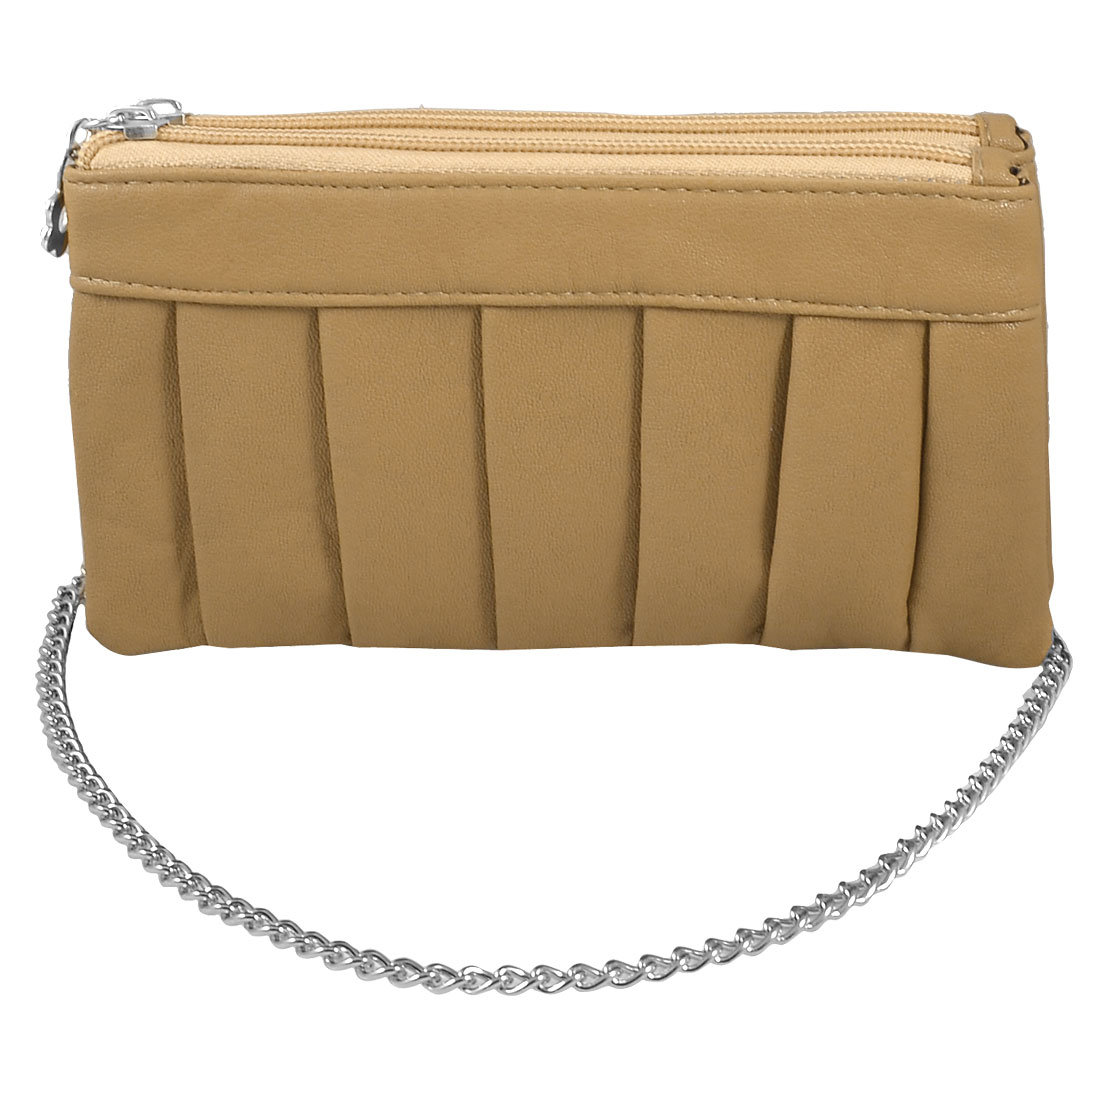 Woman Pleated Detail Faux Leather Wallet Purse Bag Beige w Wristlet Strap